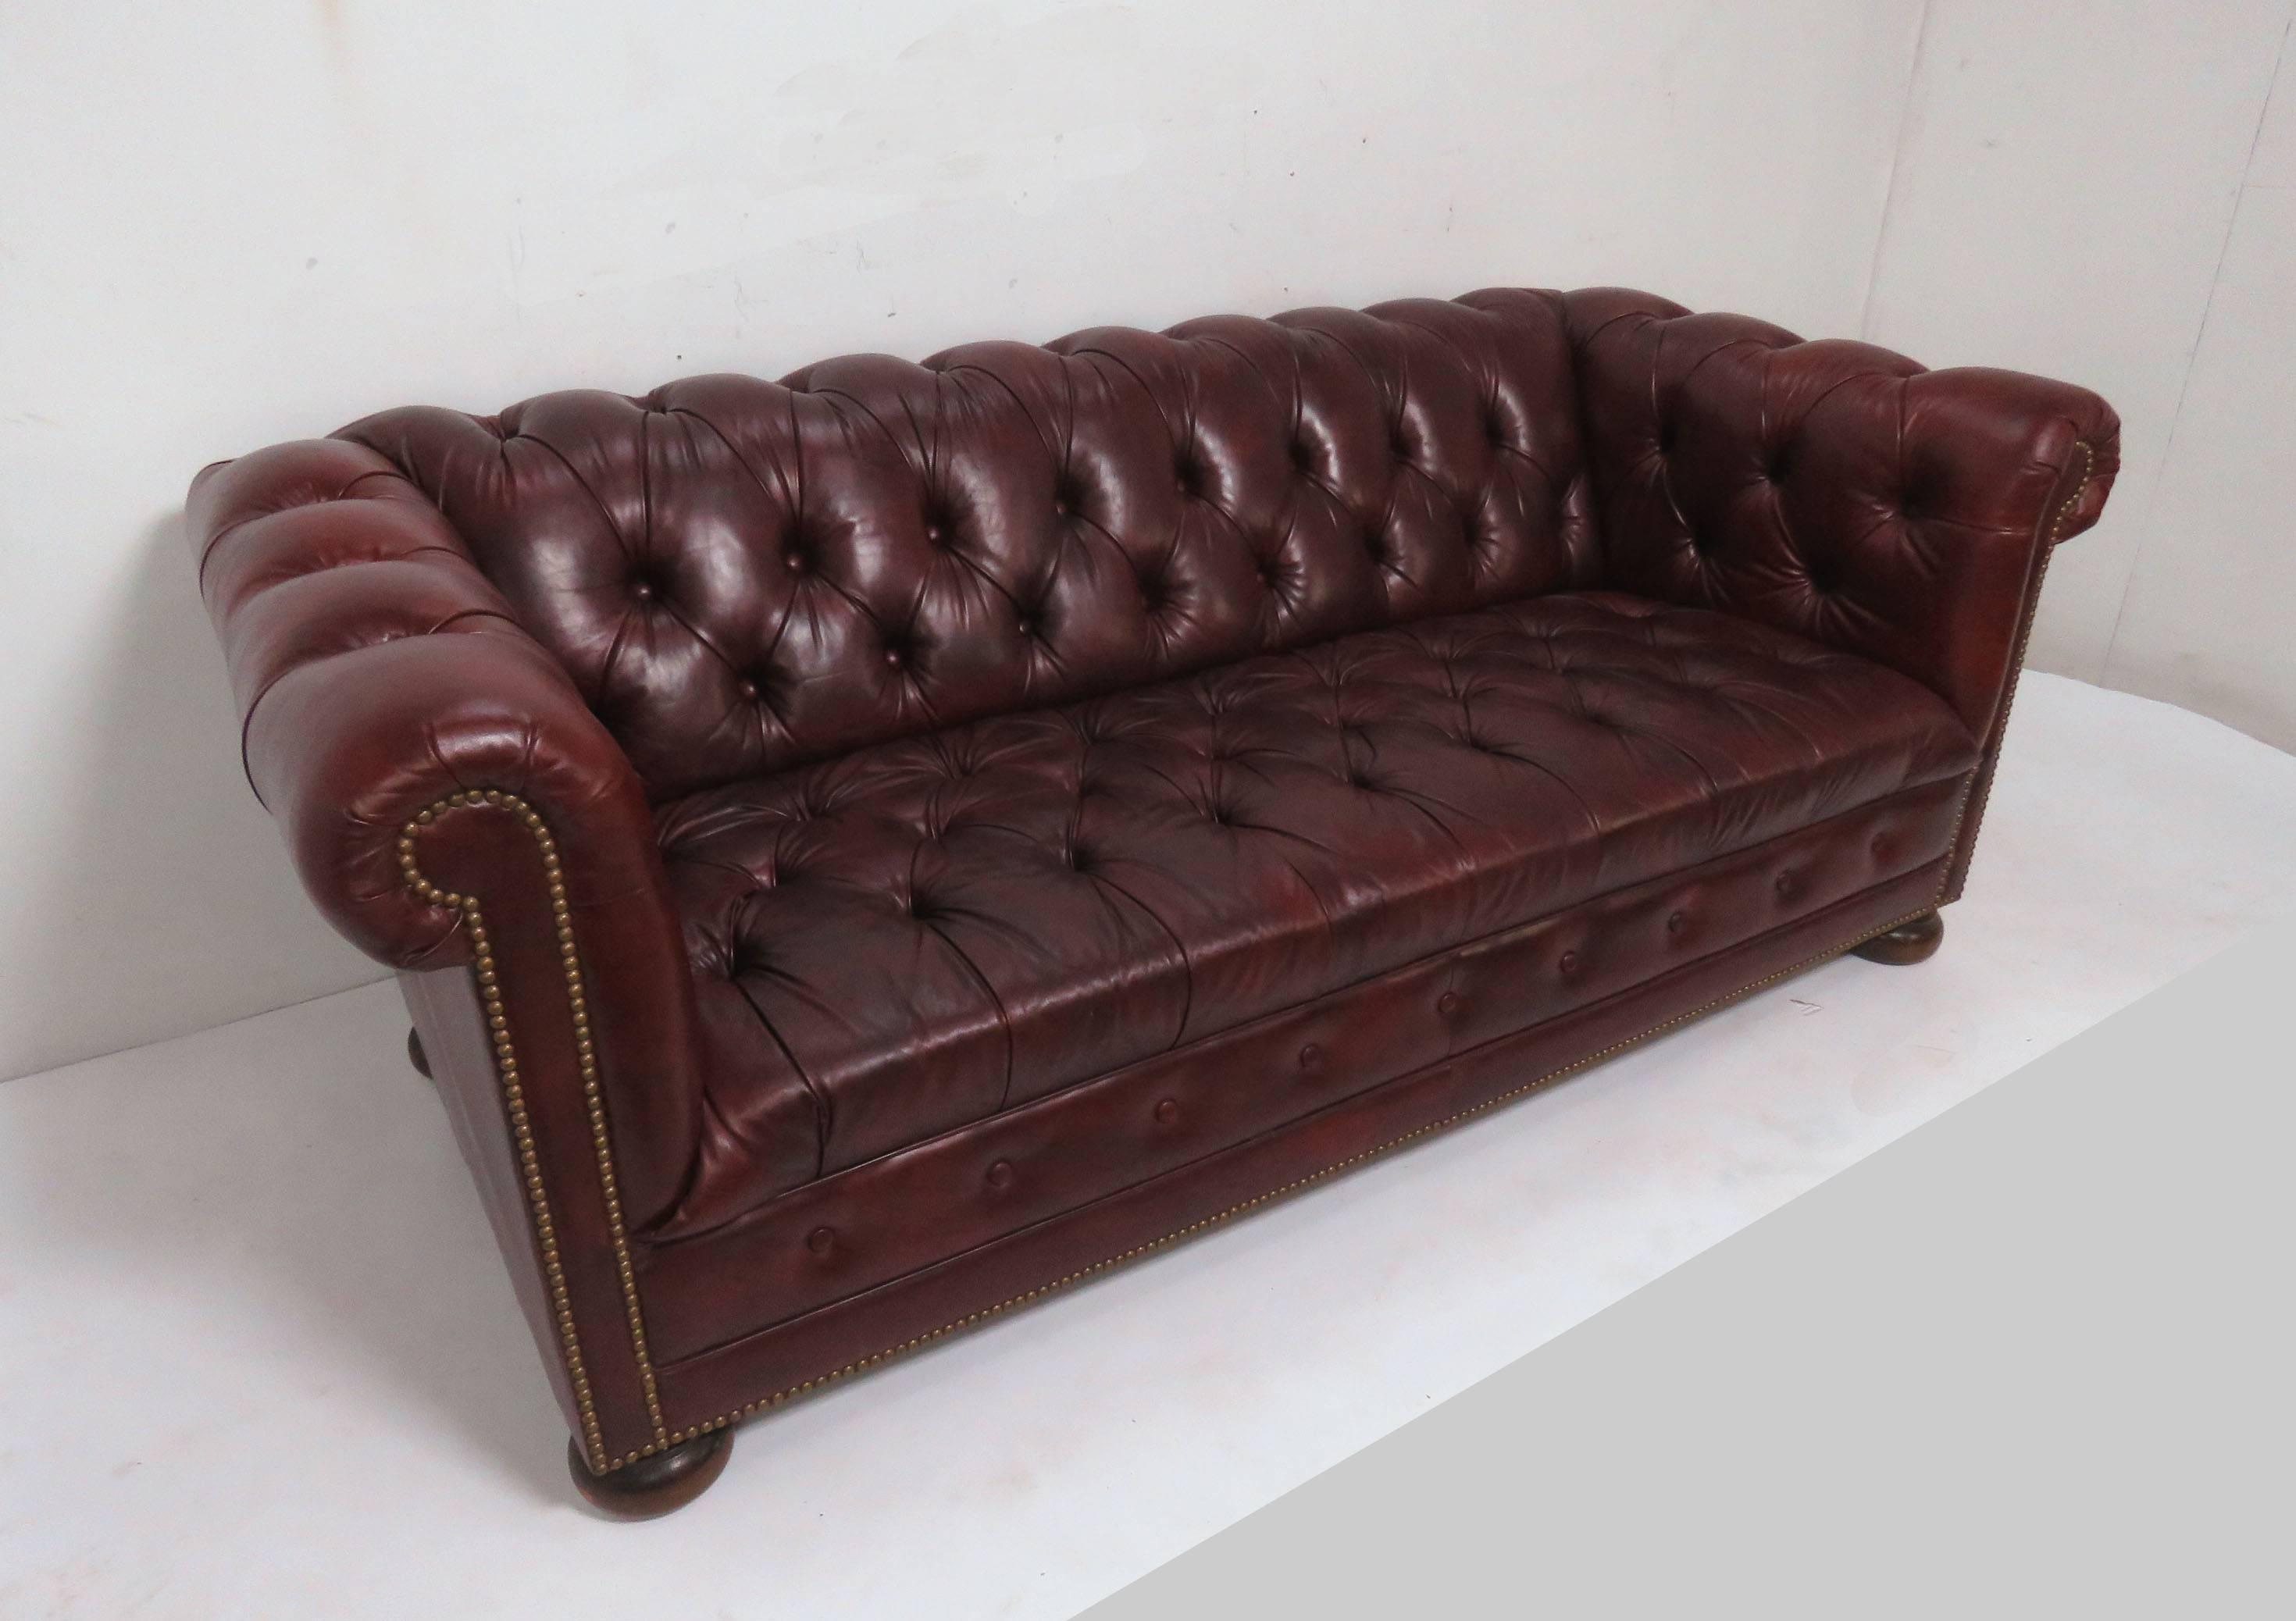 Tufted Chesterfield Sofa In Cordovan Leather, Circa 1970s